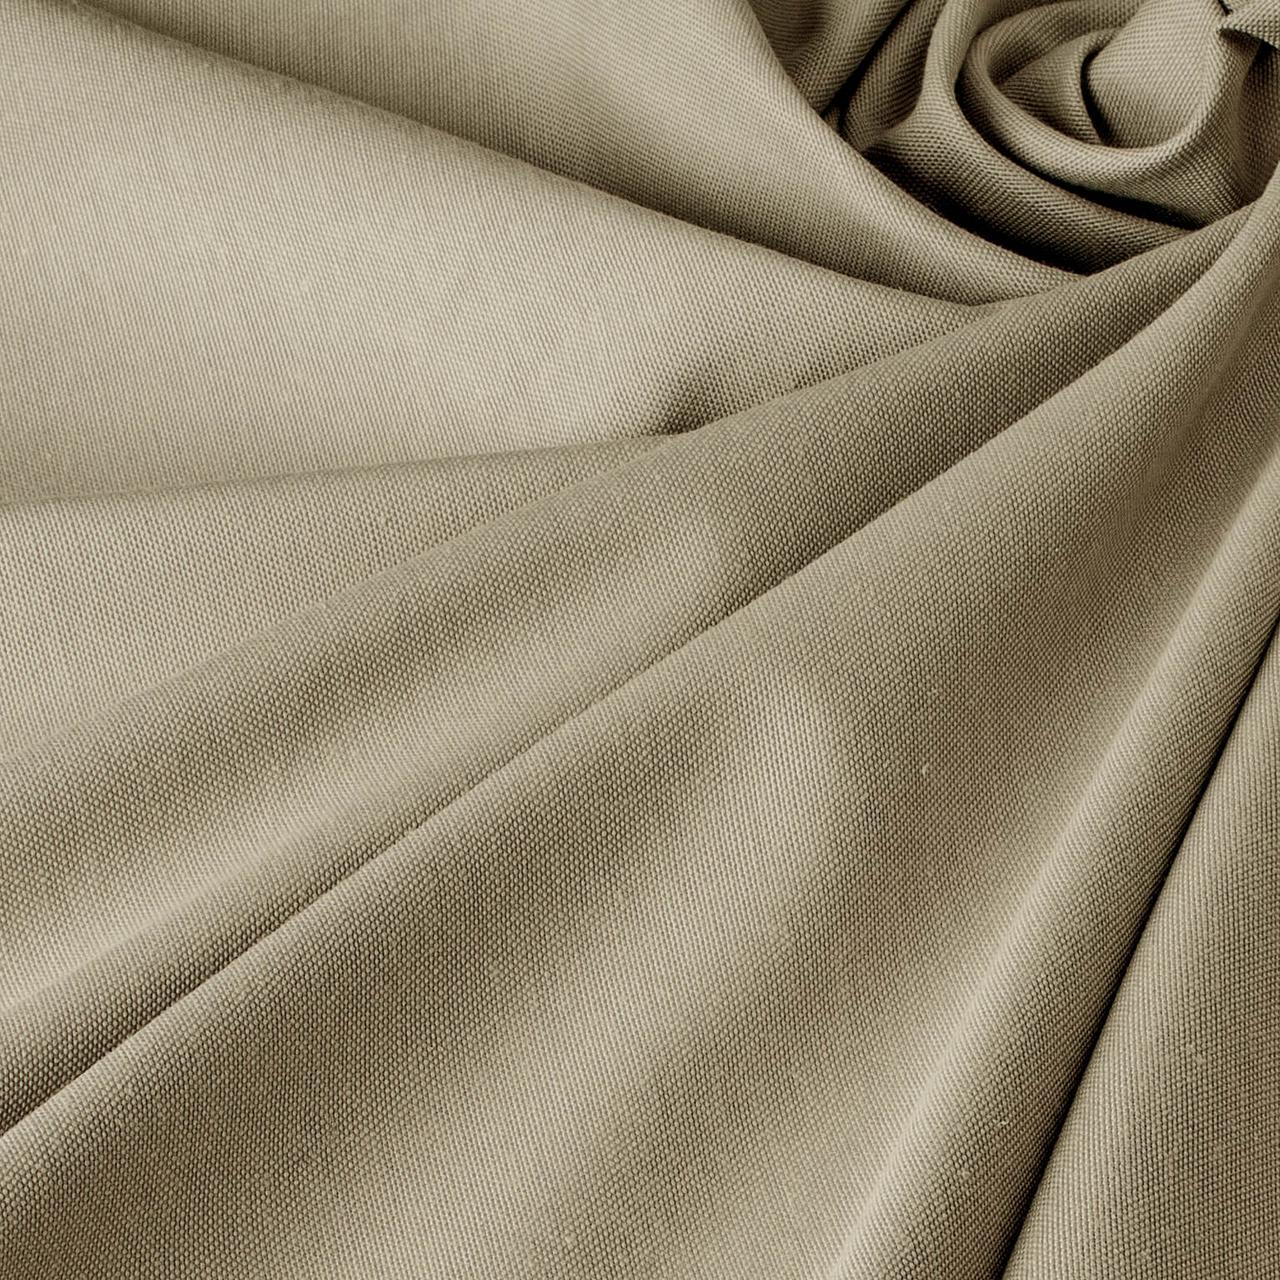 Ткань для штор и скатертей Teflon DRK v 7967